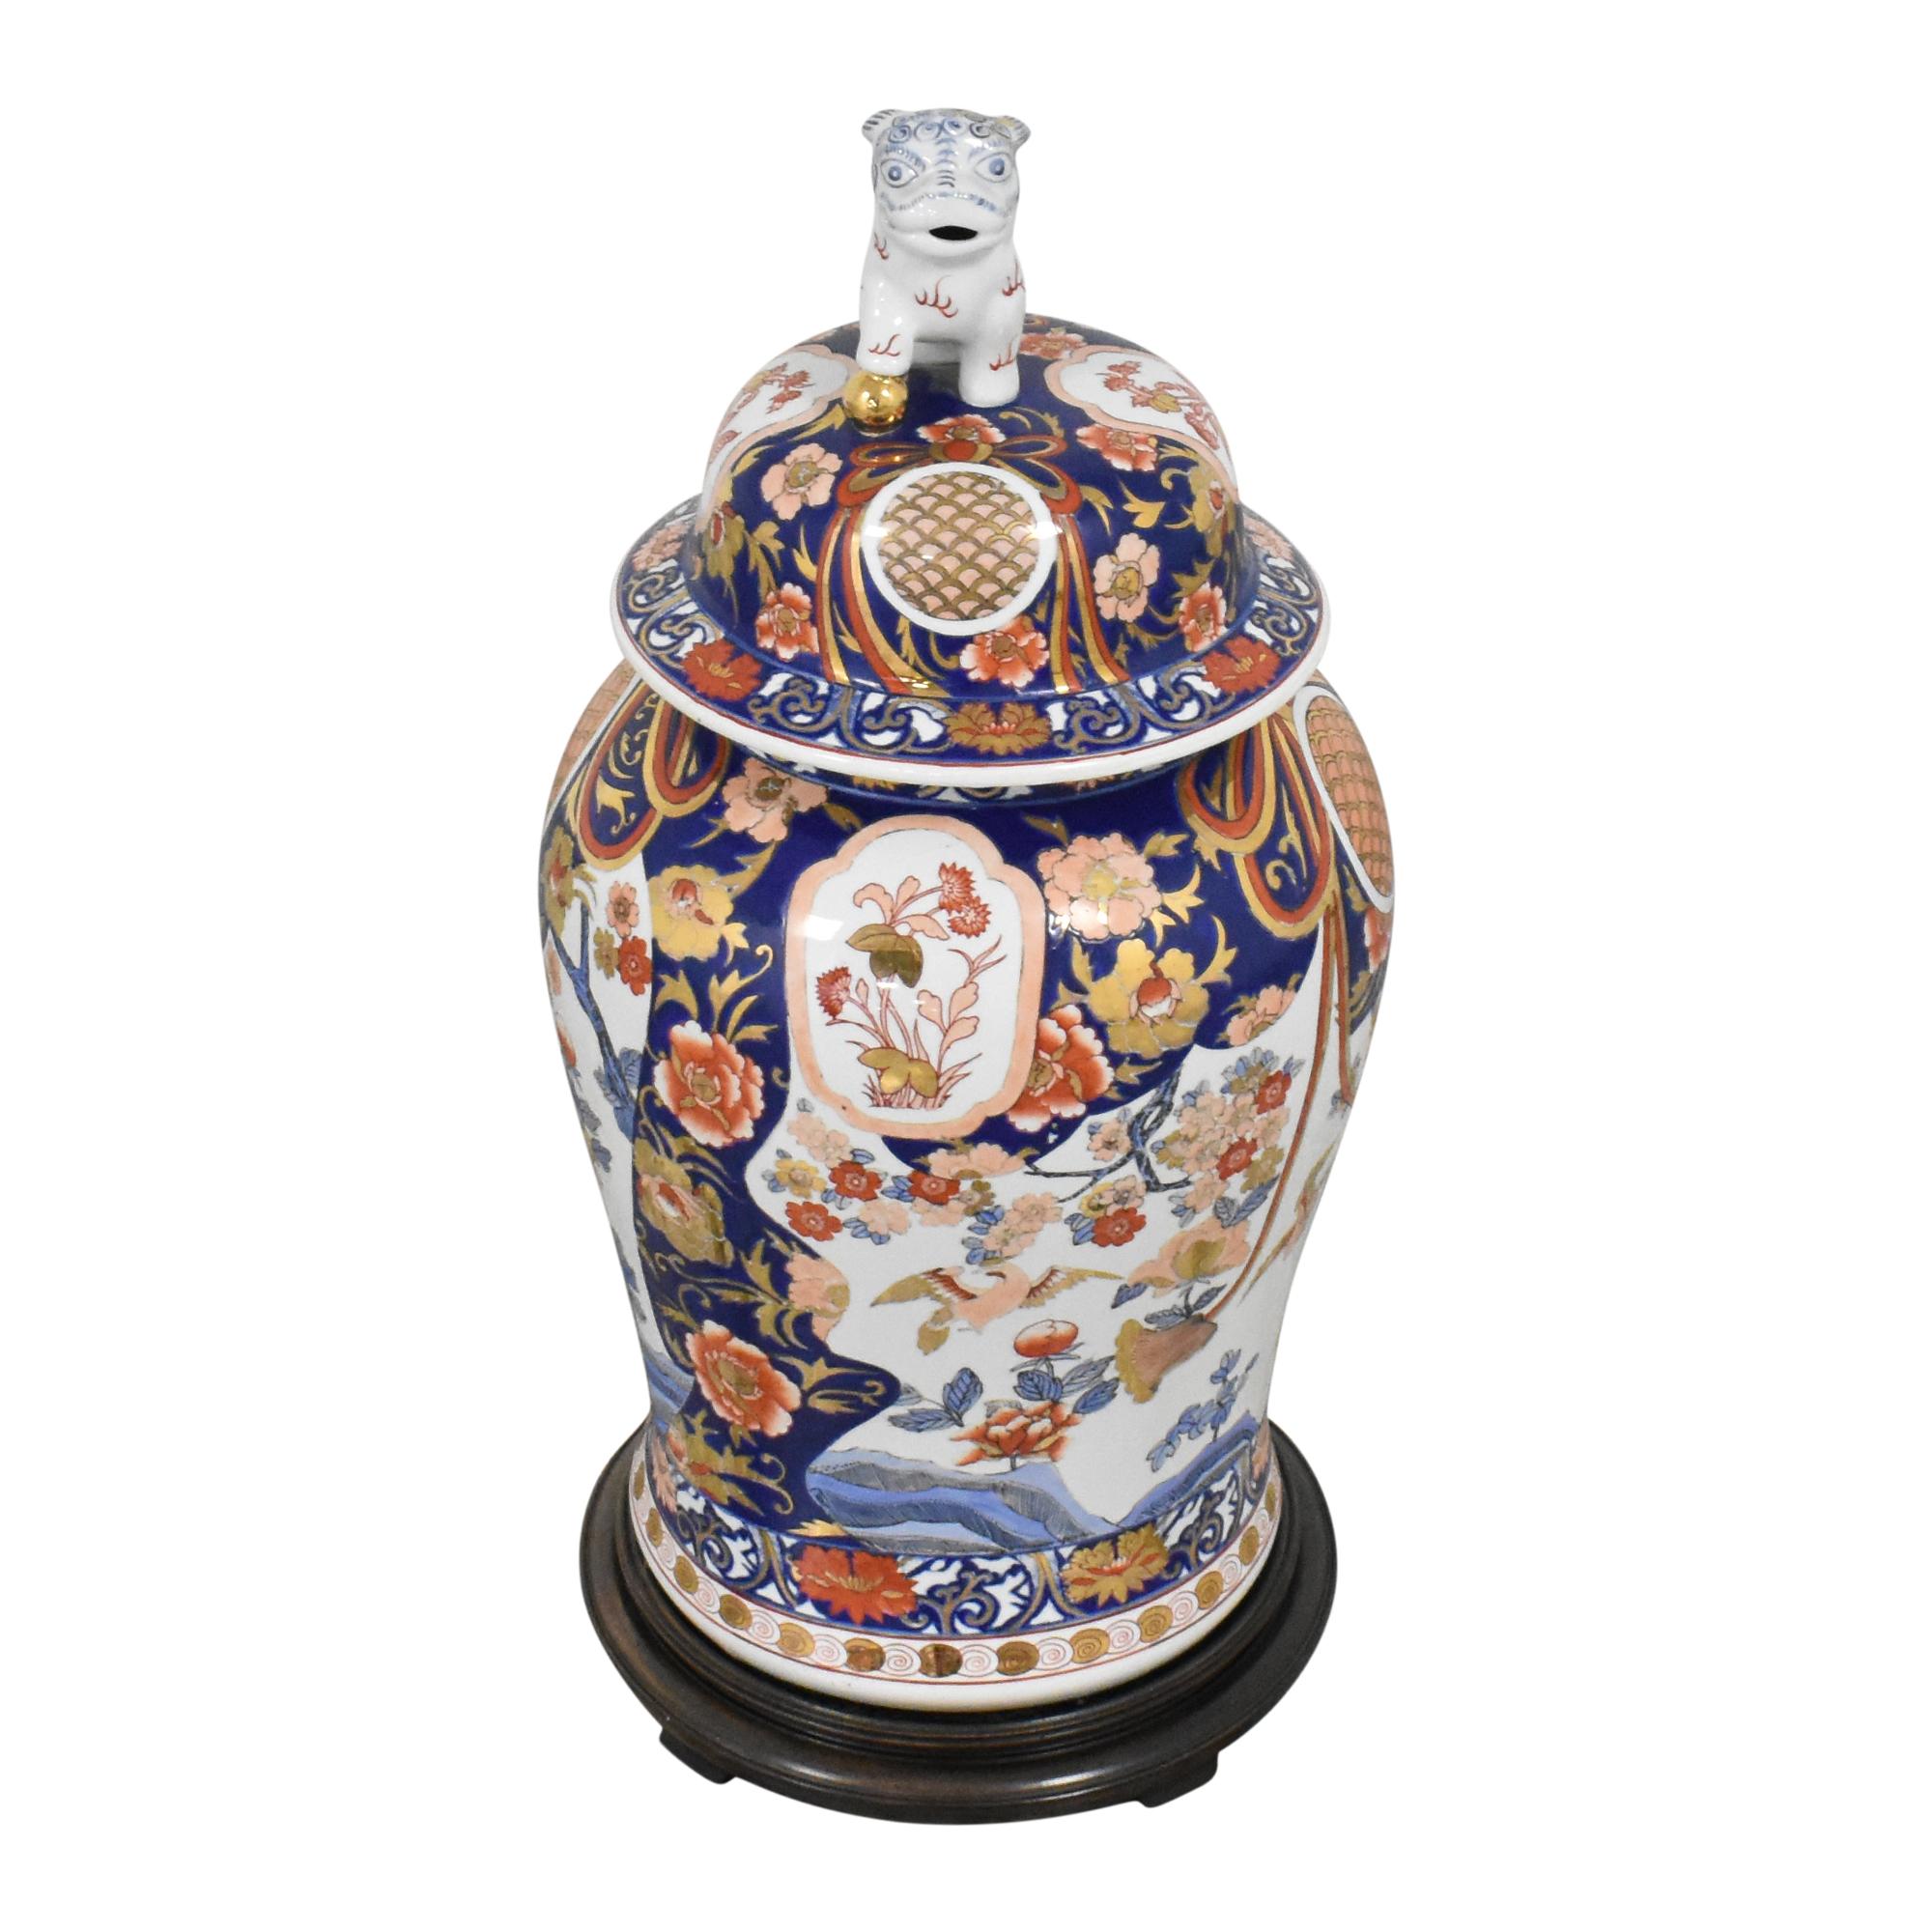 Maitland-Smith Maitland-Smith Decorative Vase ct